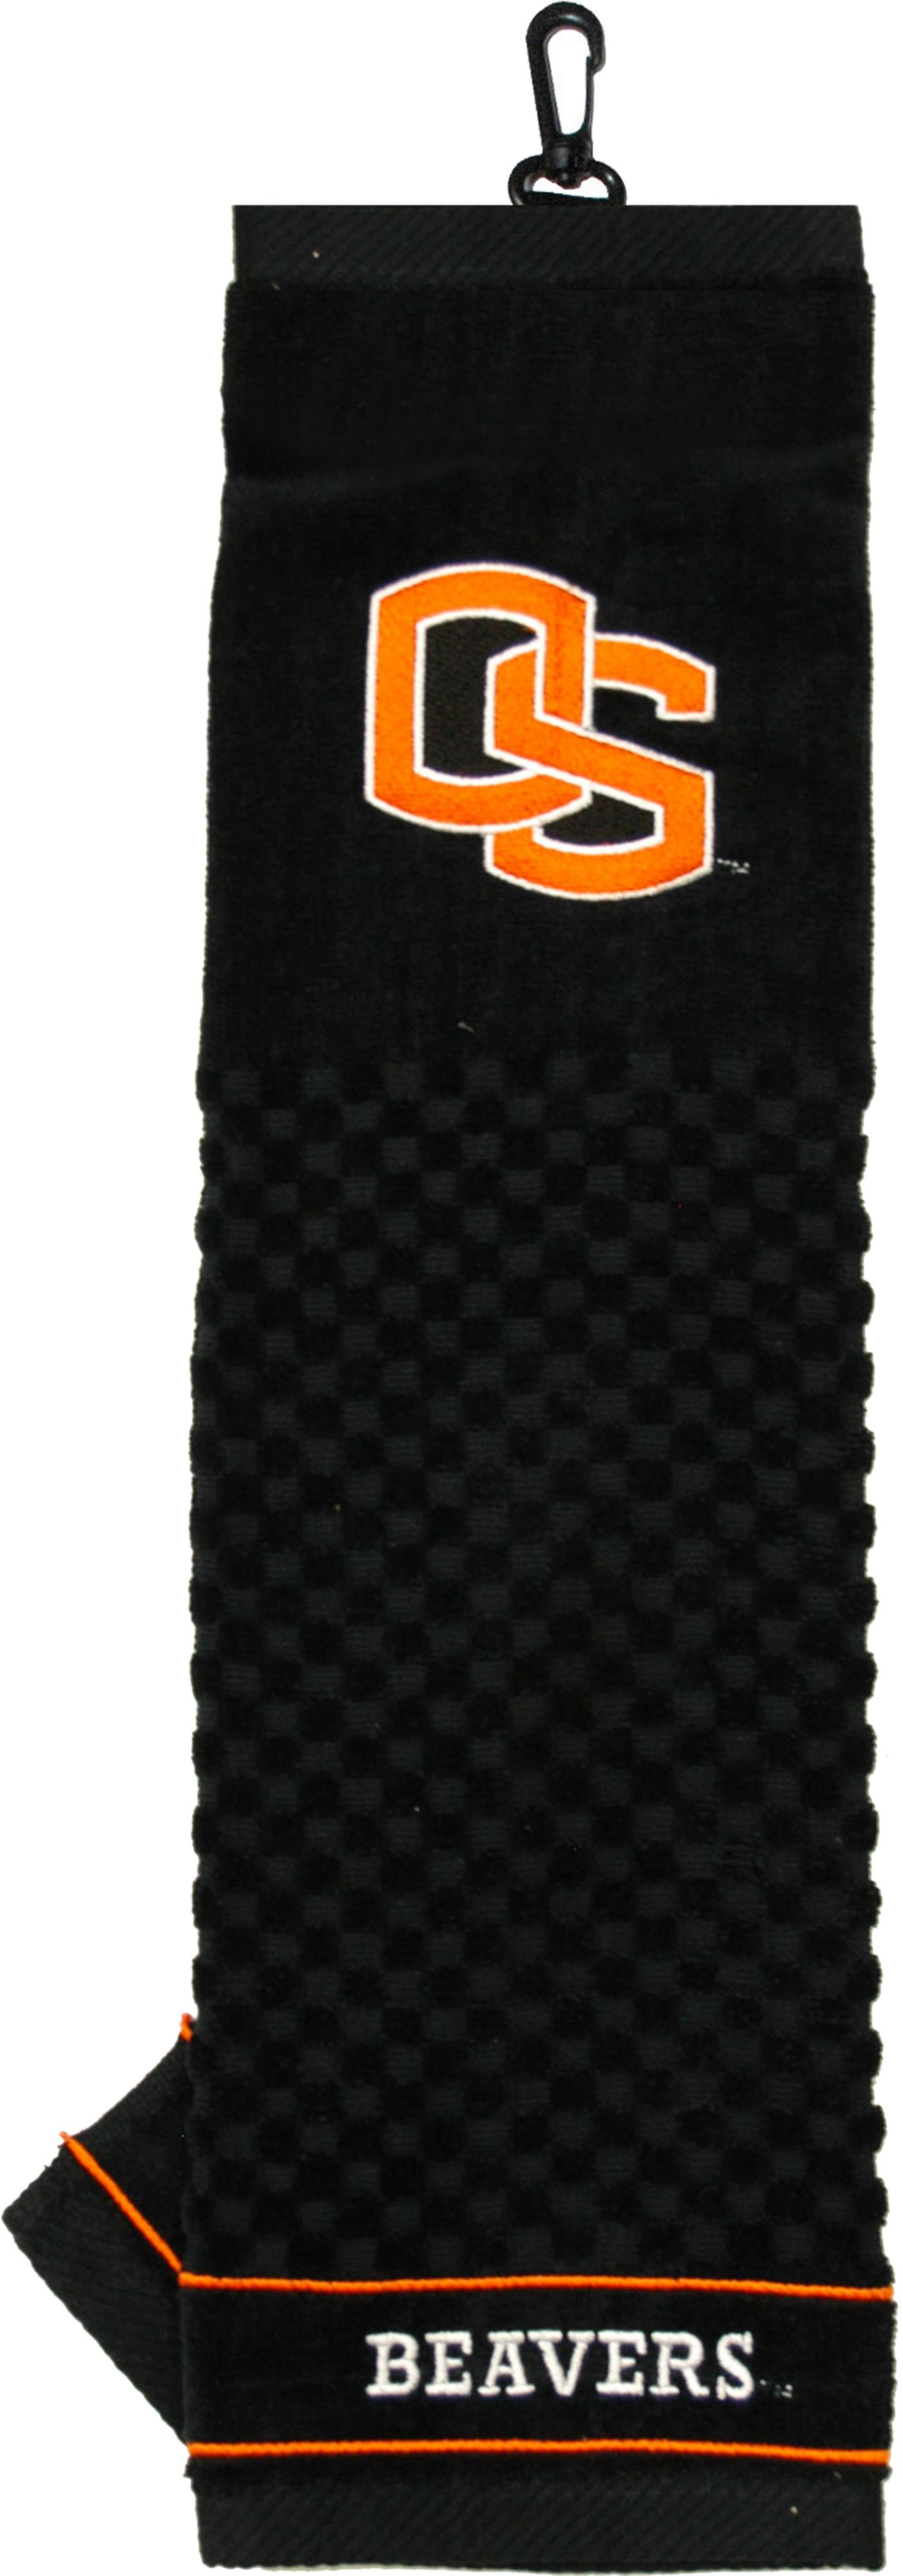 Team Golf Oregon State Beavers Embroidered Golf Towel